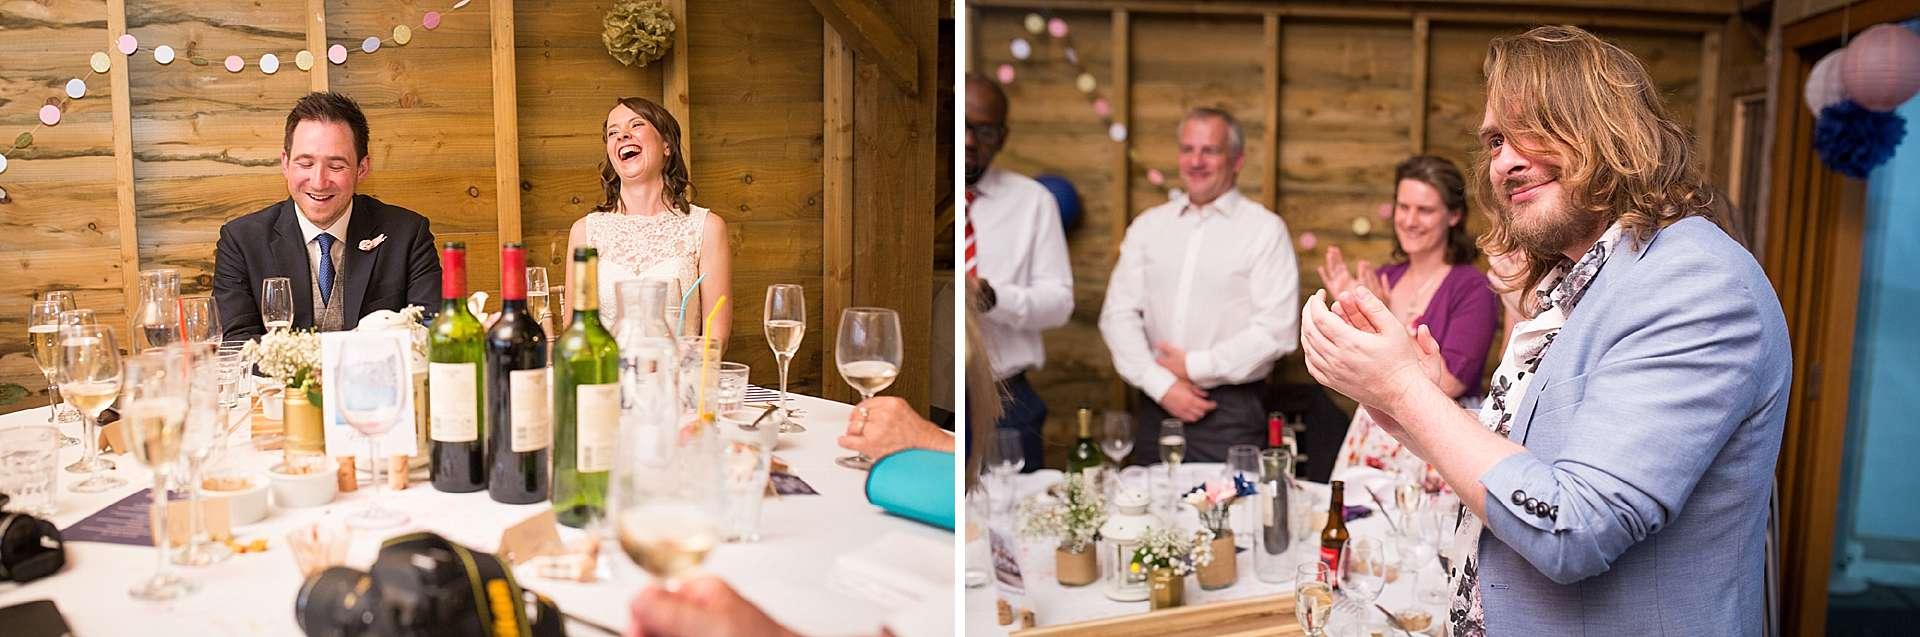 Binfield Wedding Photographer